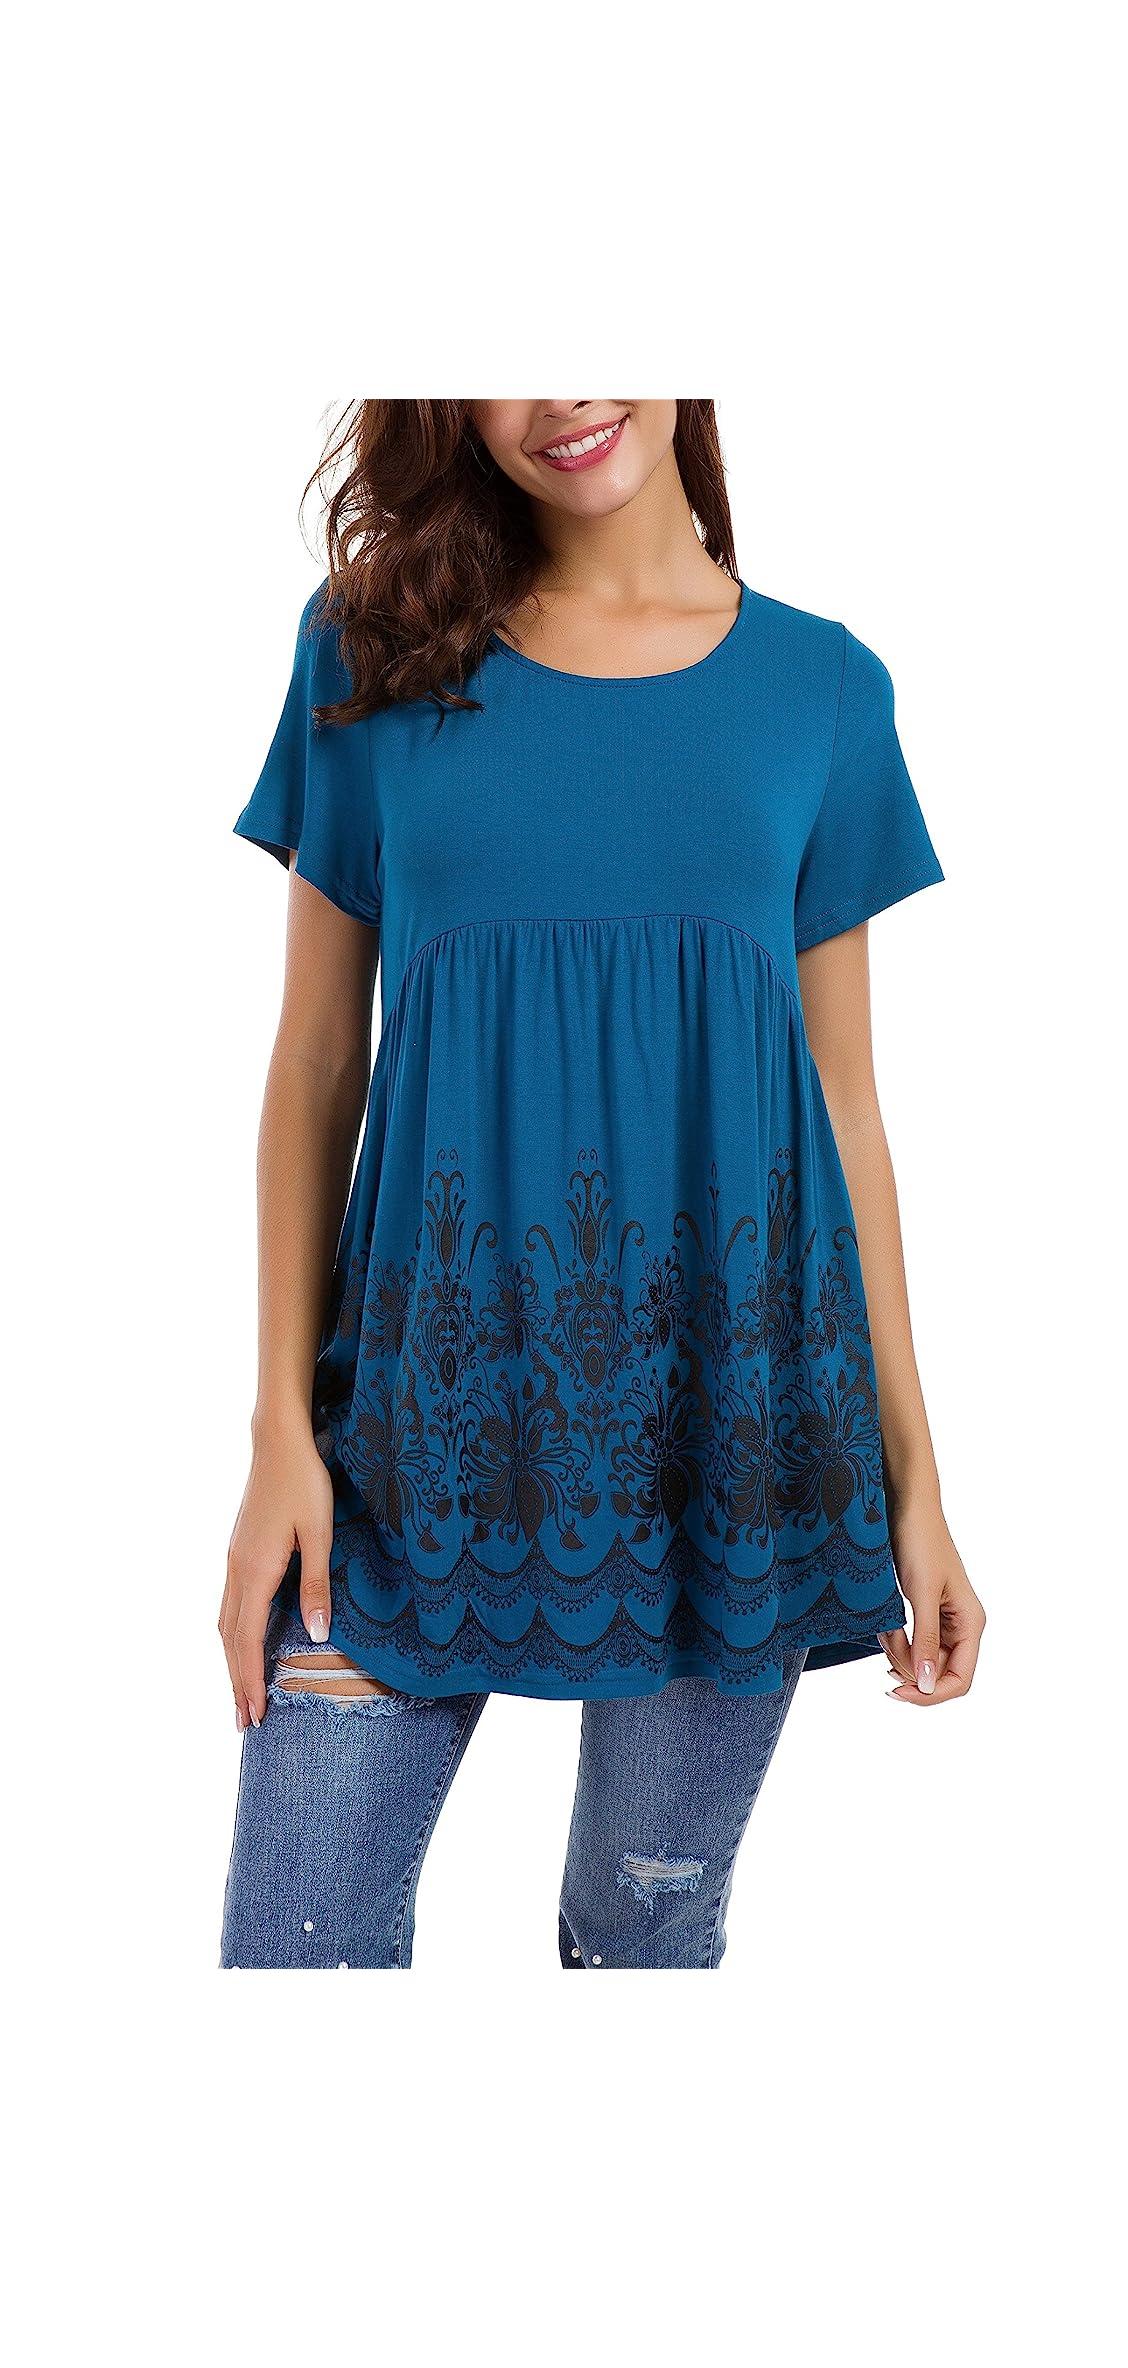 Women's Short Sleeve/sleeveless Floral Printed Flare